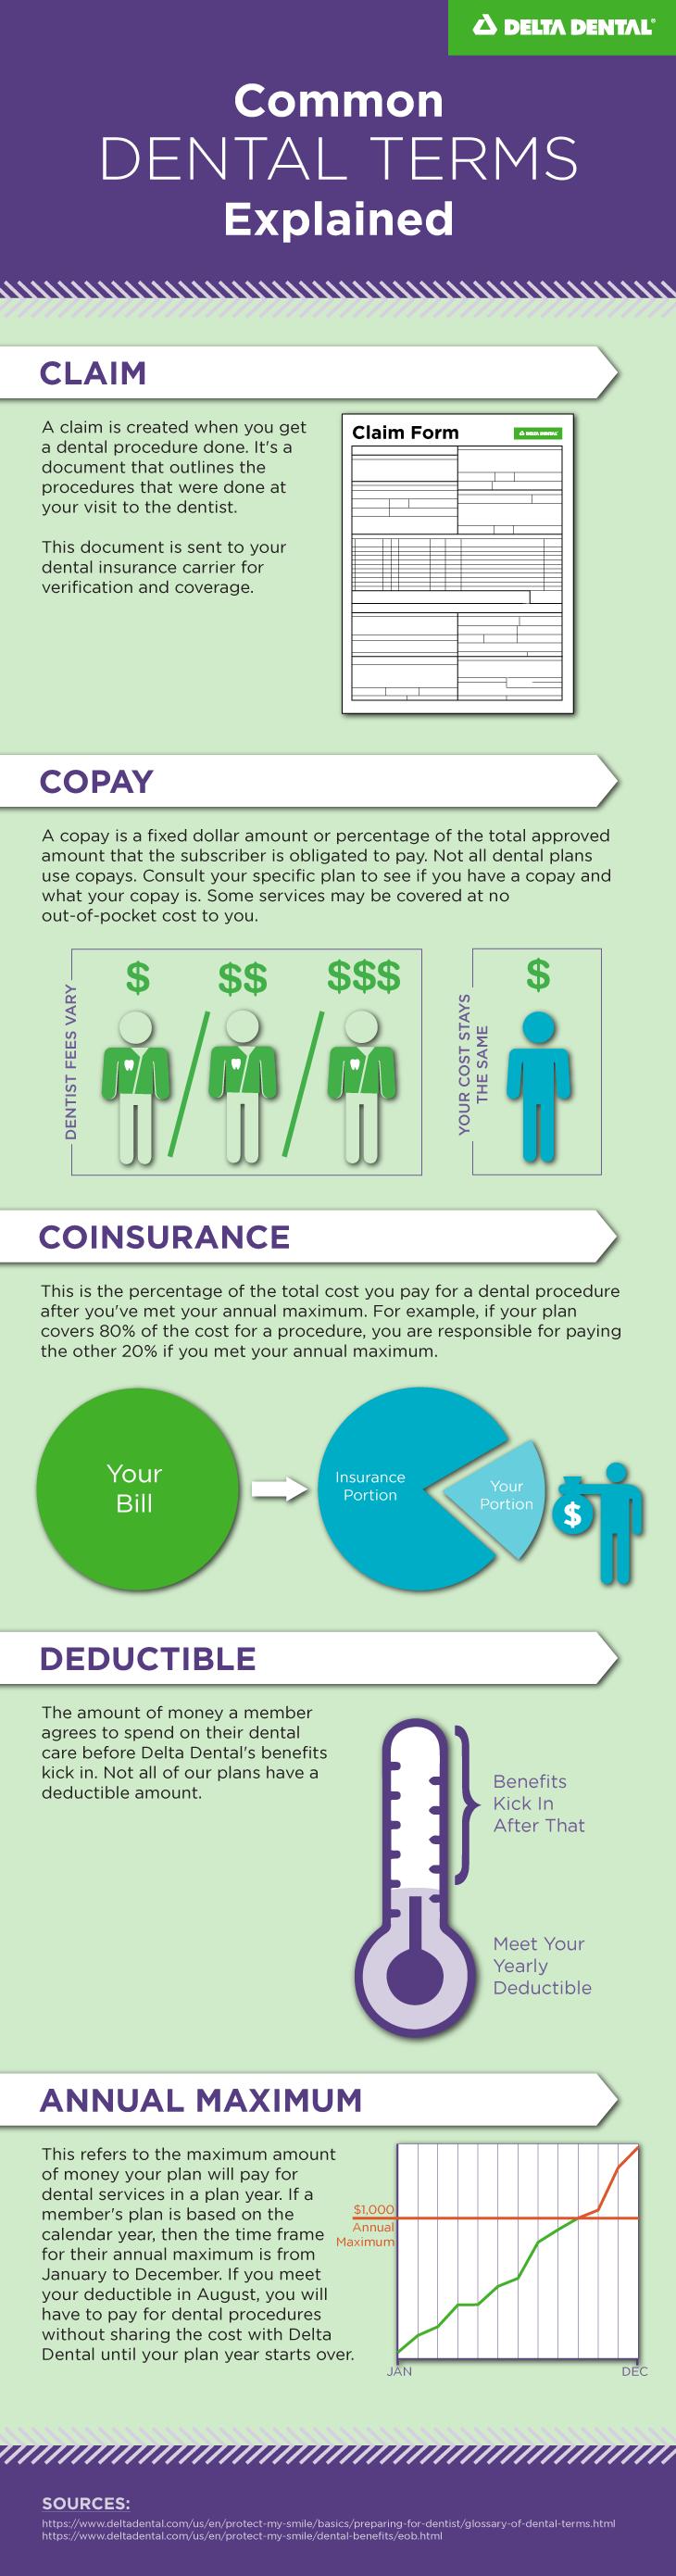 Common Terms Dental Insurance Explained Dental Preventive Care